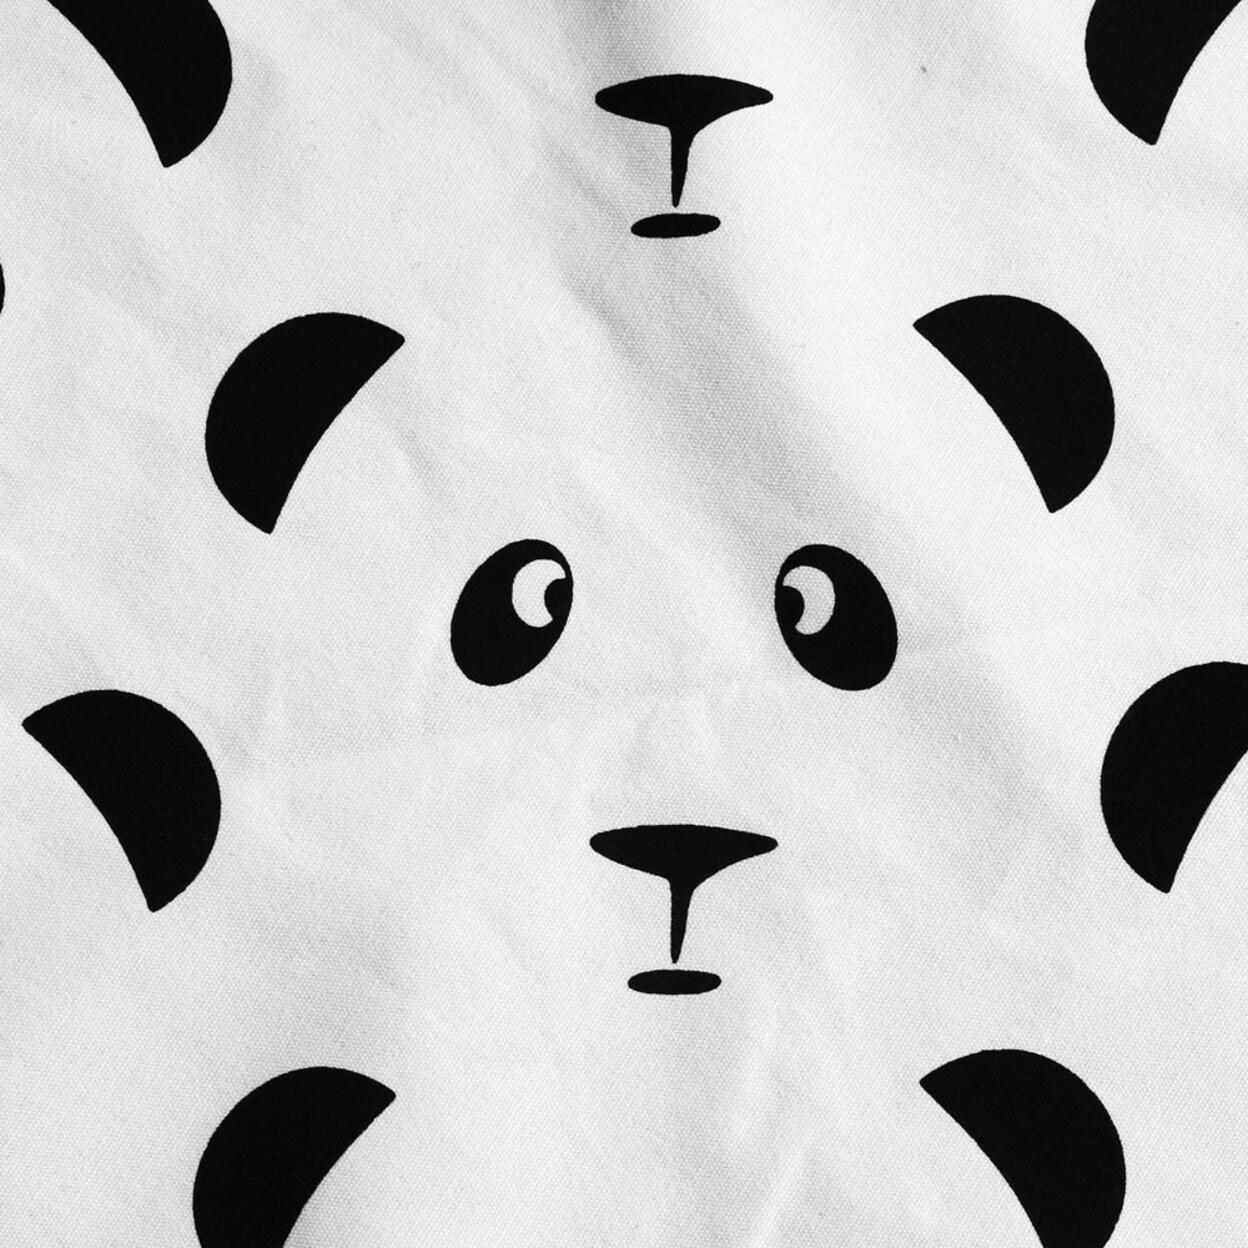 Baby Toys Game Blanket Storage Canvas Bags Kids Panda Printed Cute Carpet Overstock 27512139